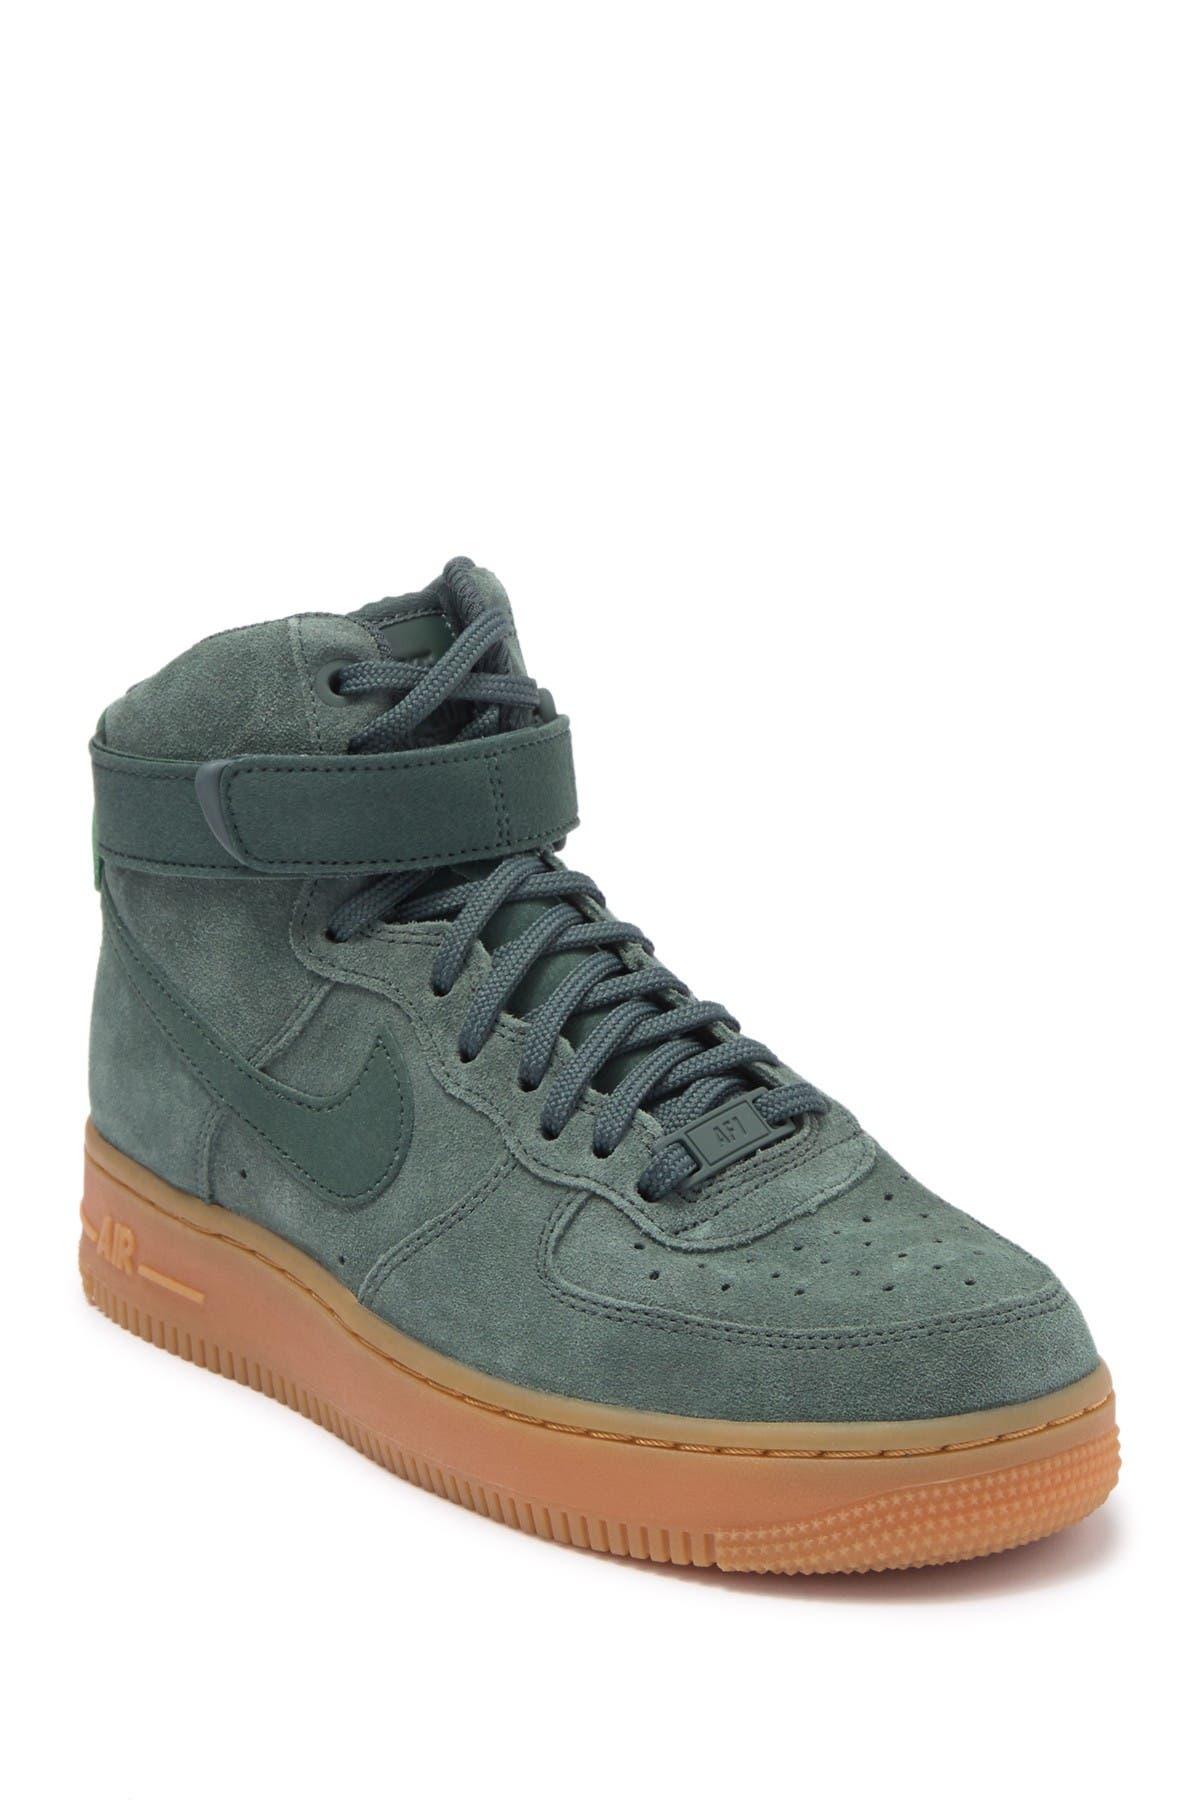 Nike | Air Force 1 Suede Mid-Top